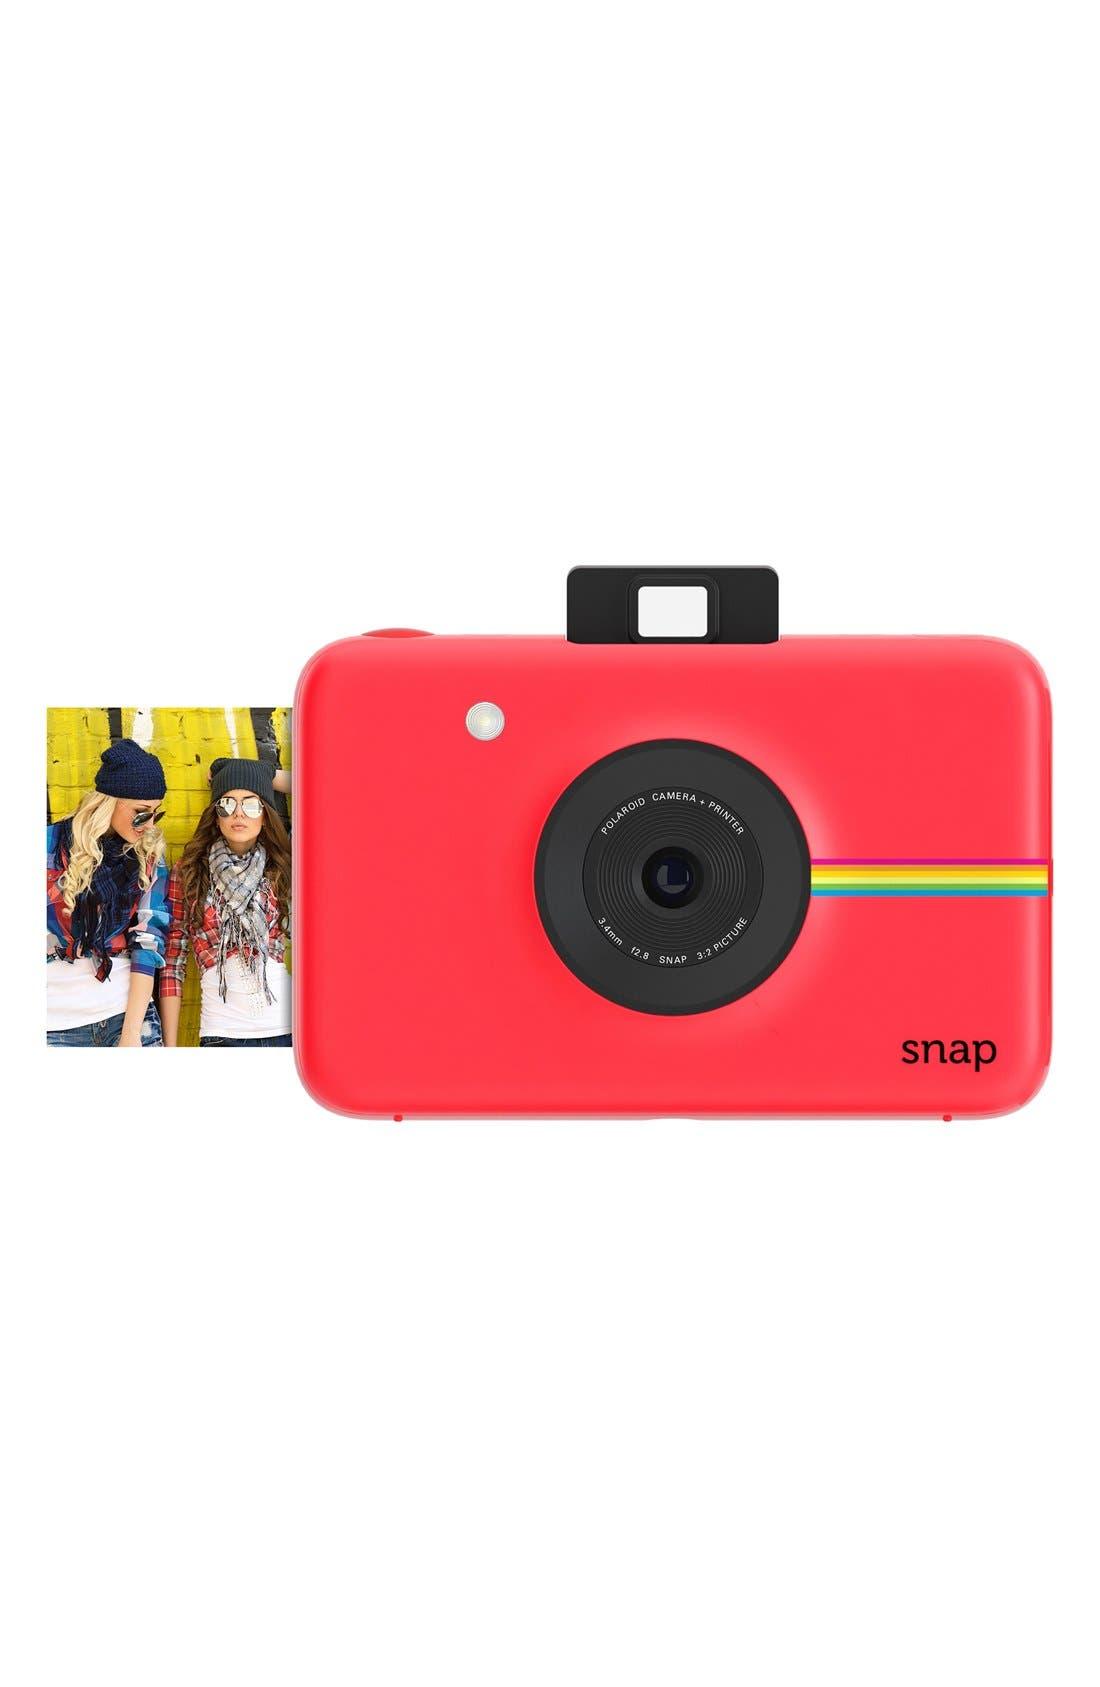 Alternate Image 1 Selected - Polaroid 'Snap' Instant Digital Camera